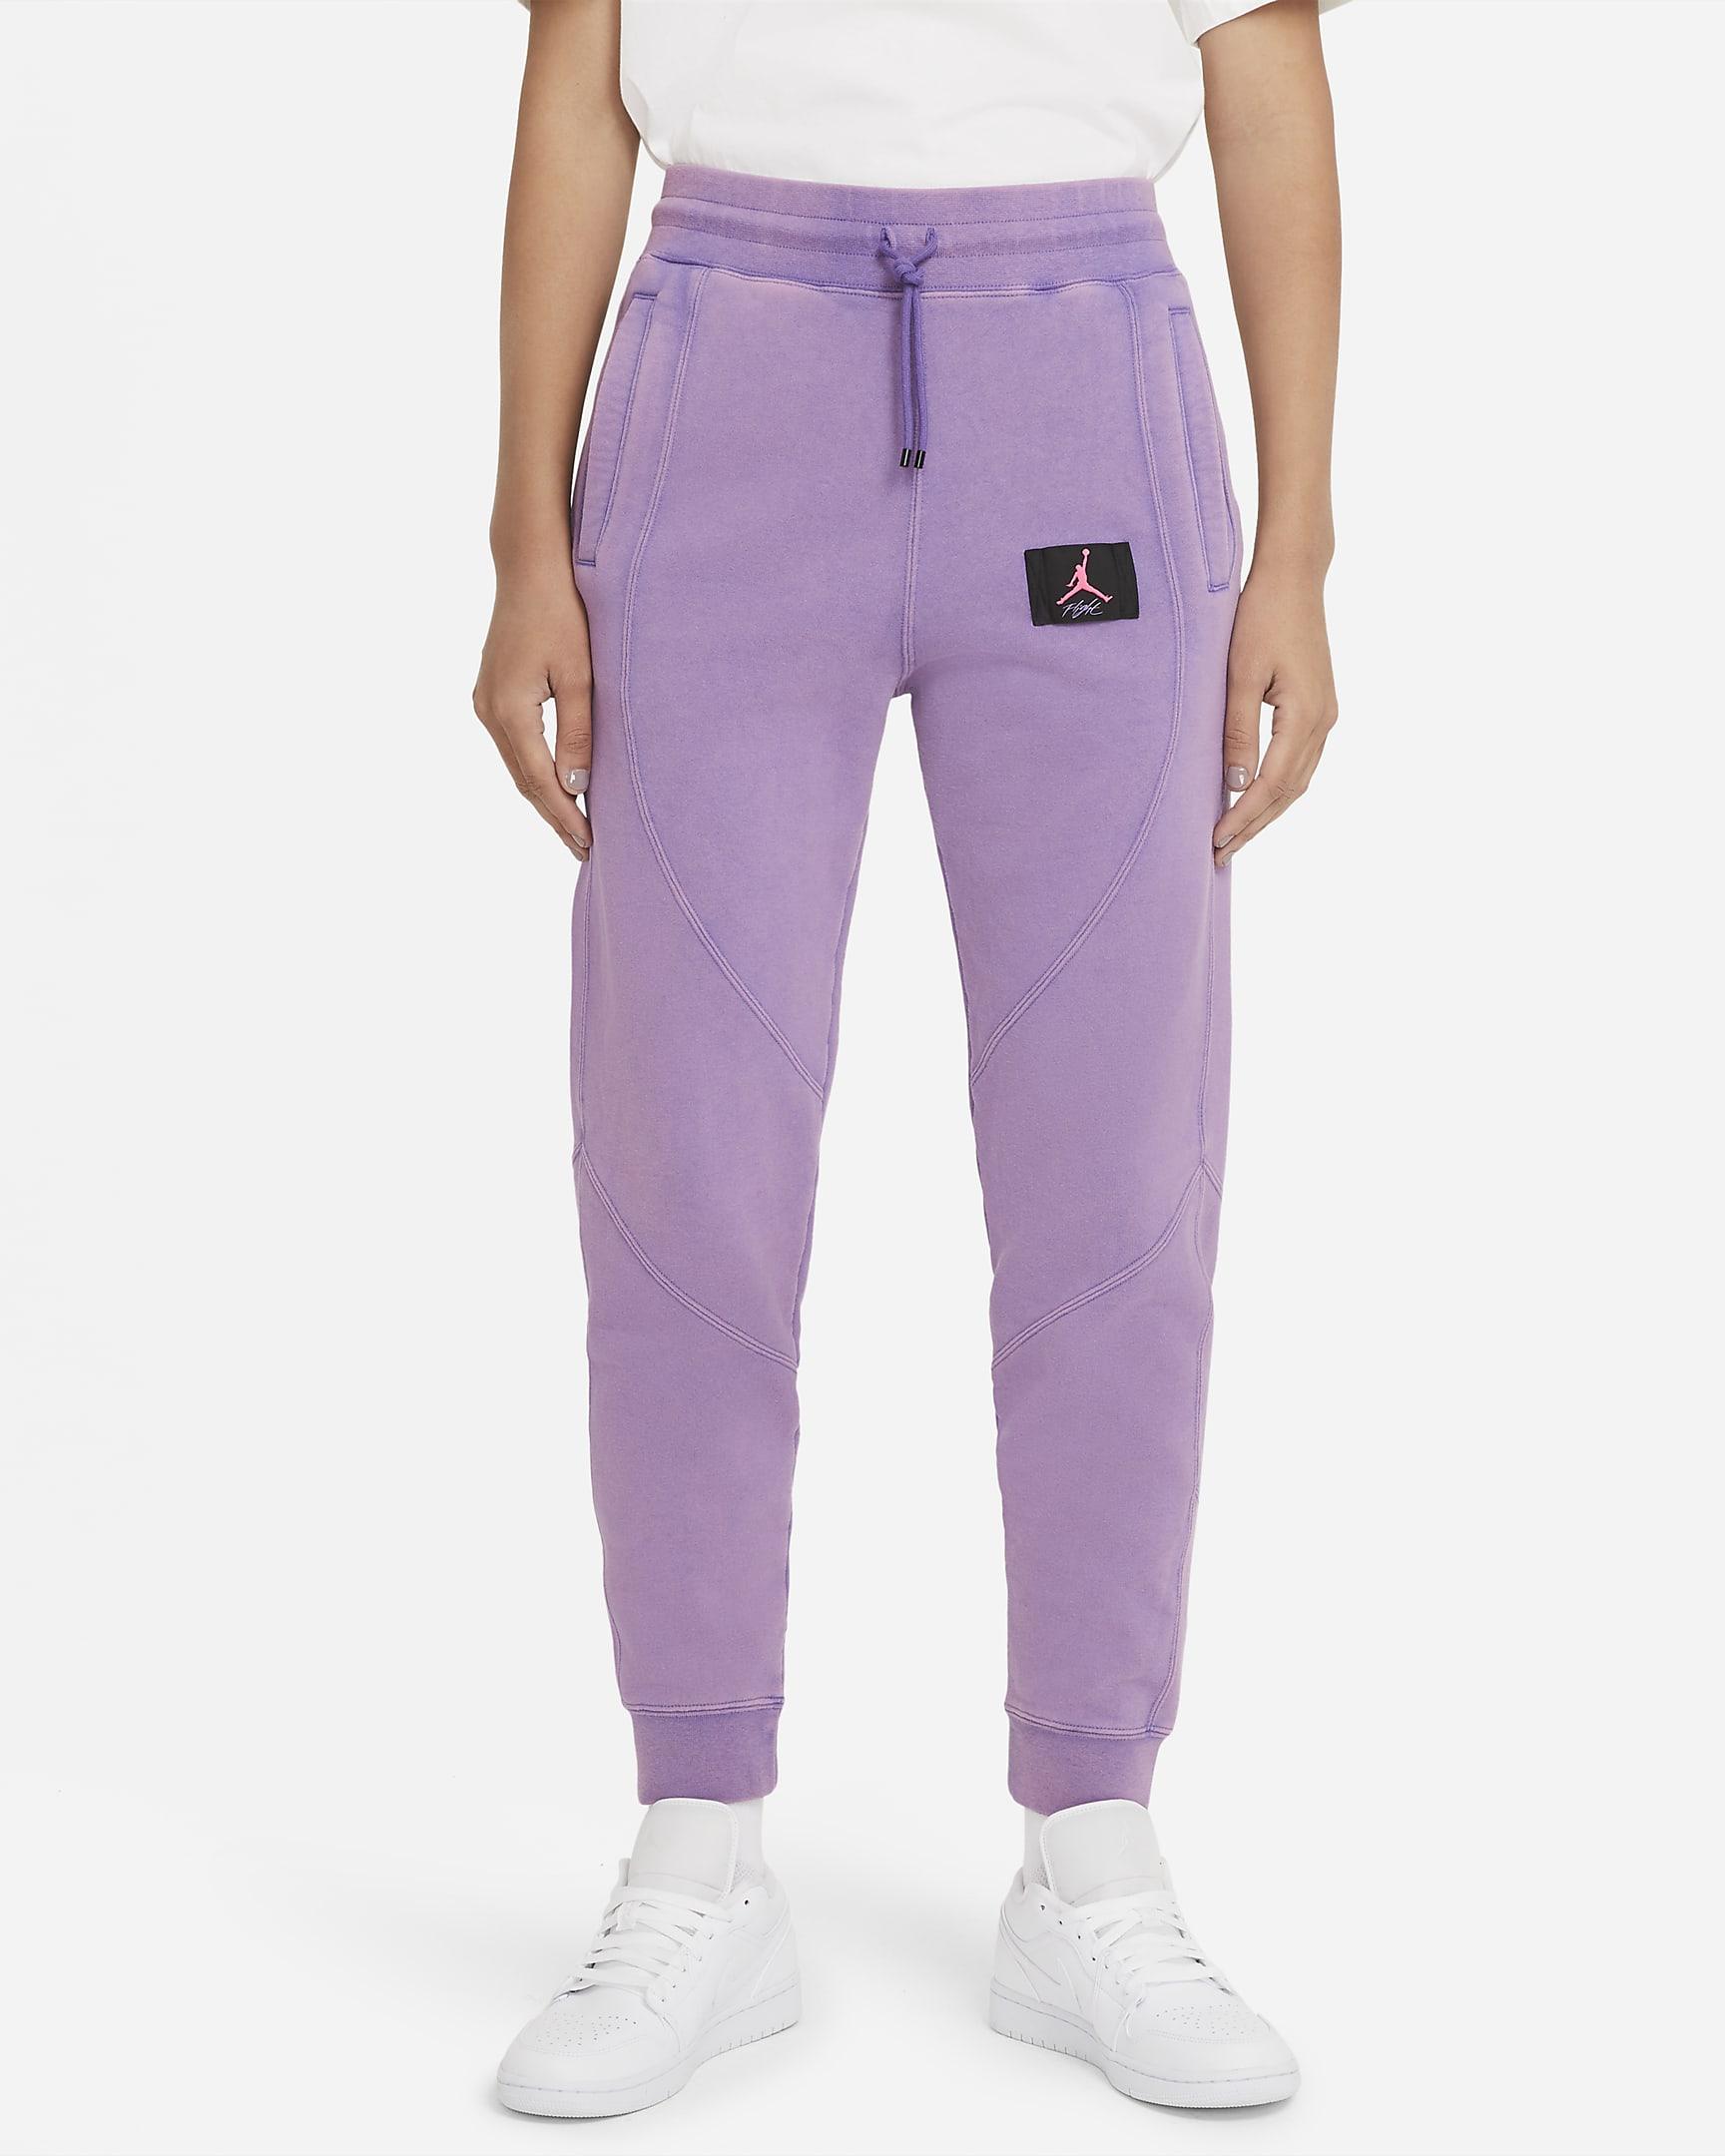 jordan-flight-womens-fleece-pants-0Bl3RW